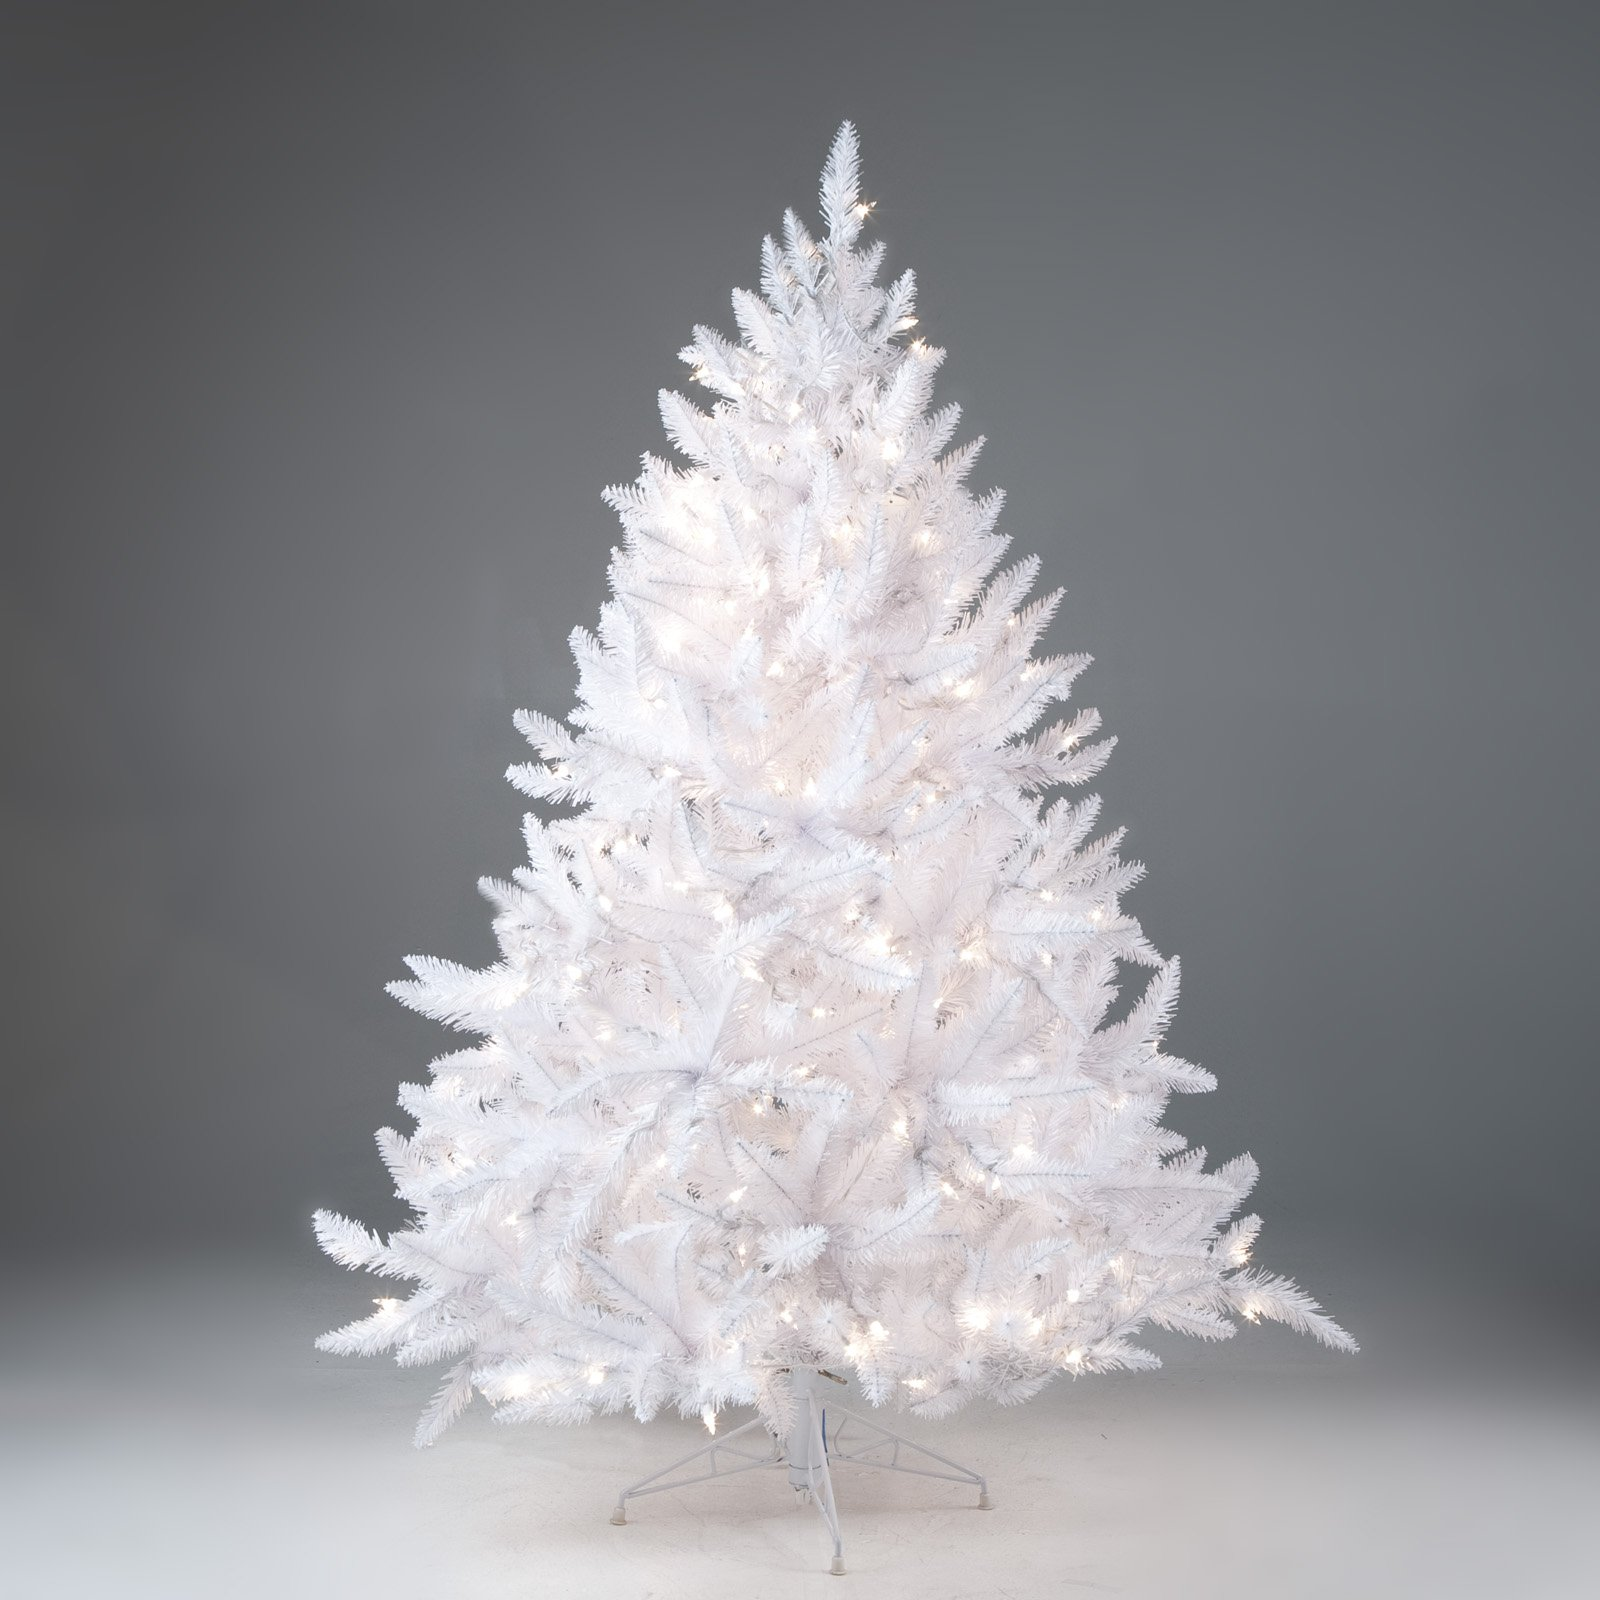 Winter Park Tabletop Pre-lit Christmas Tree - 4.5 ft. - Walmart.com